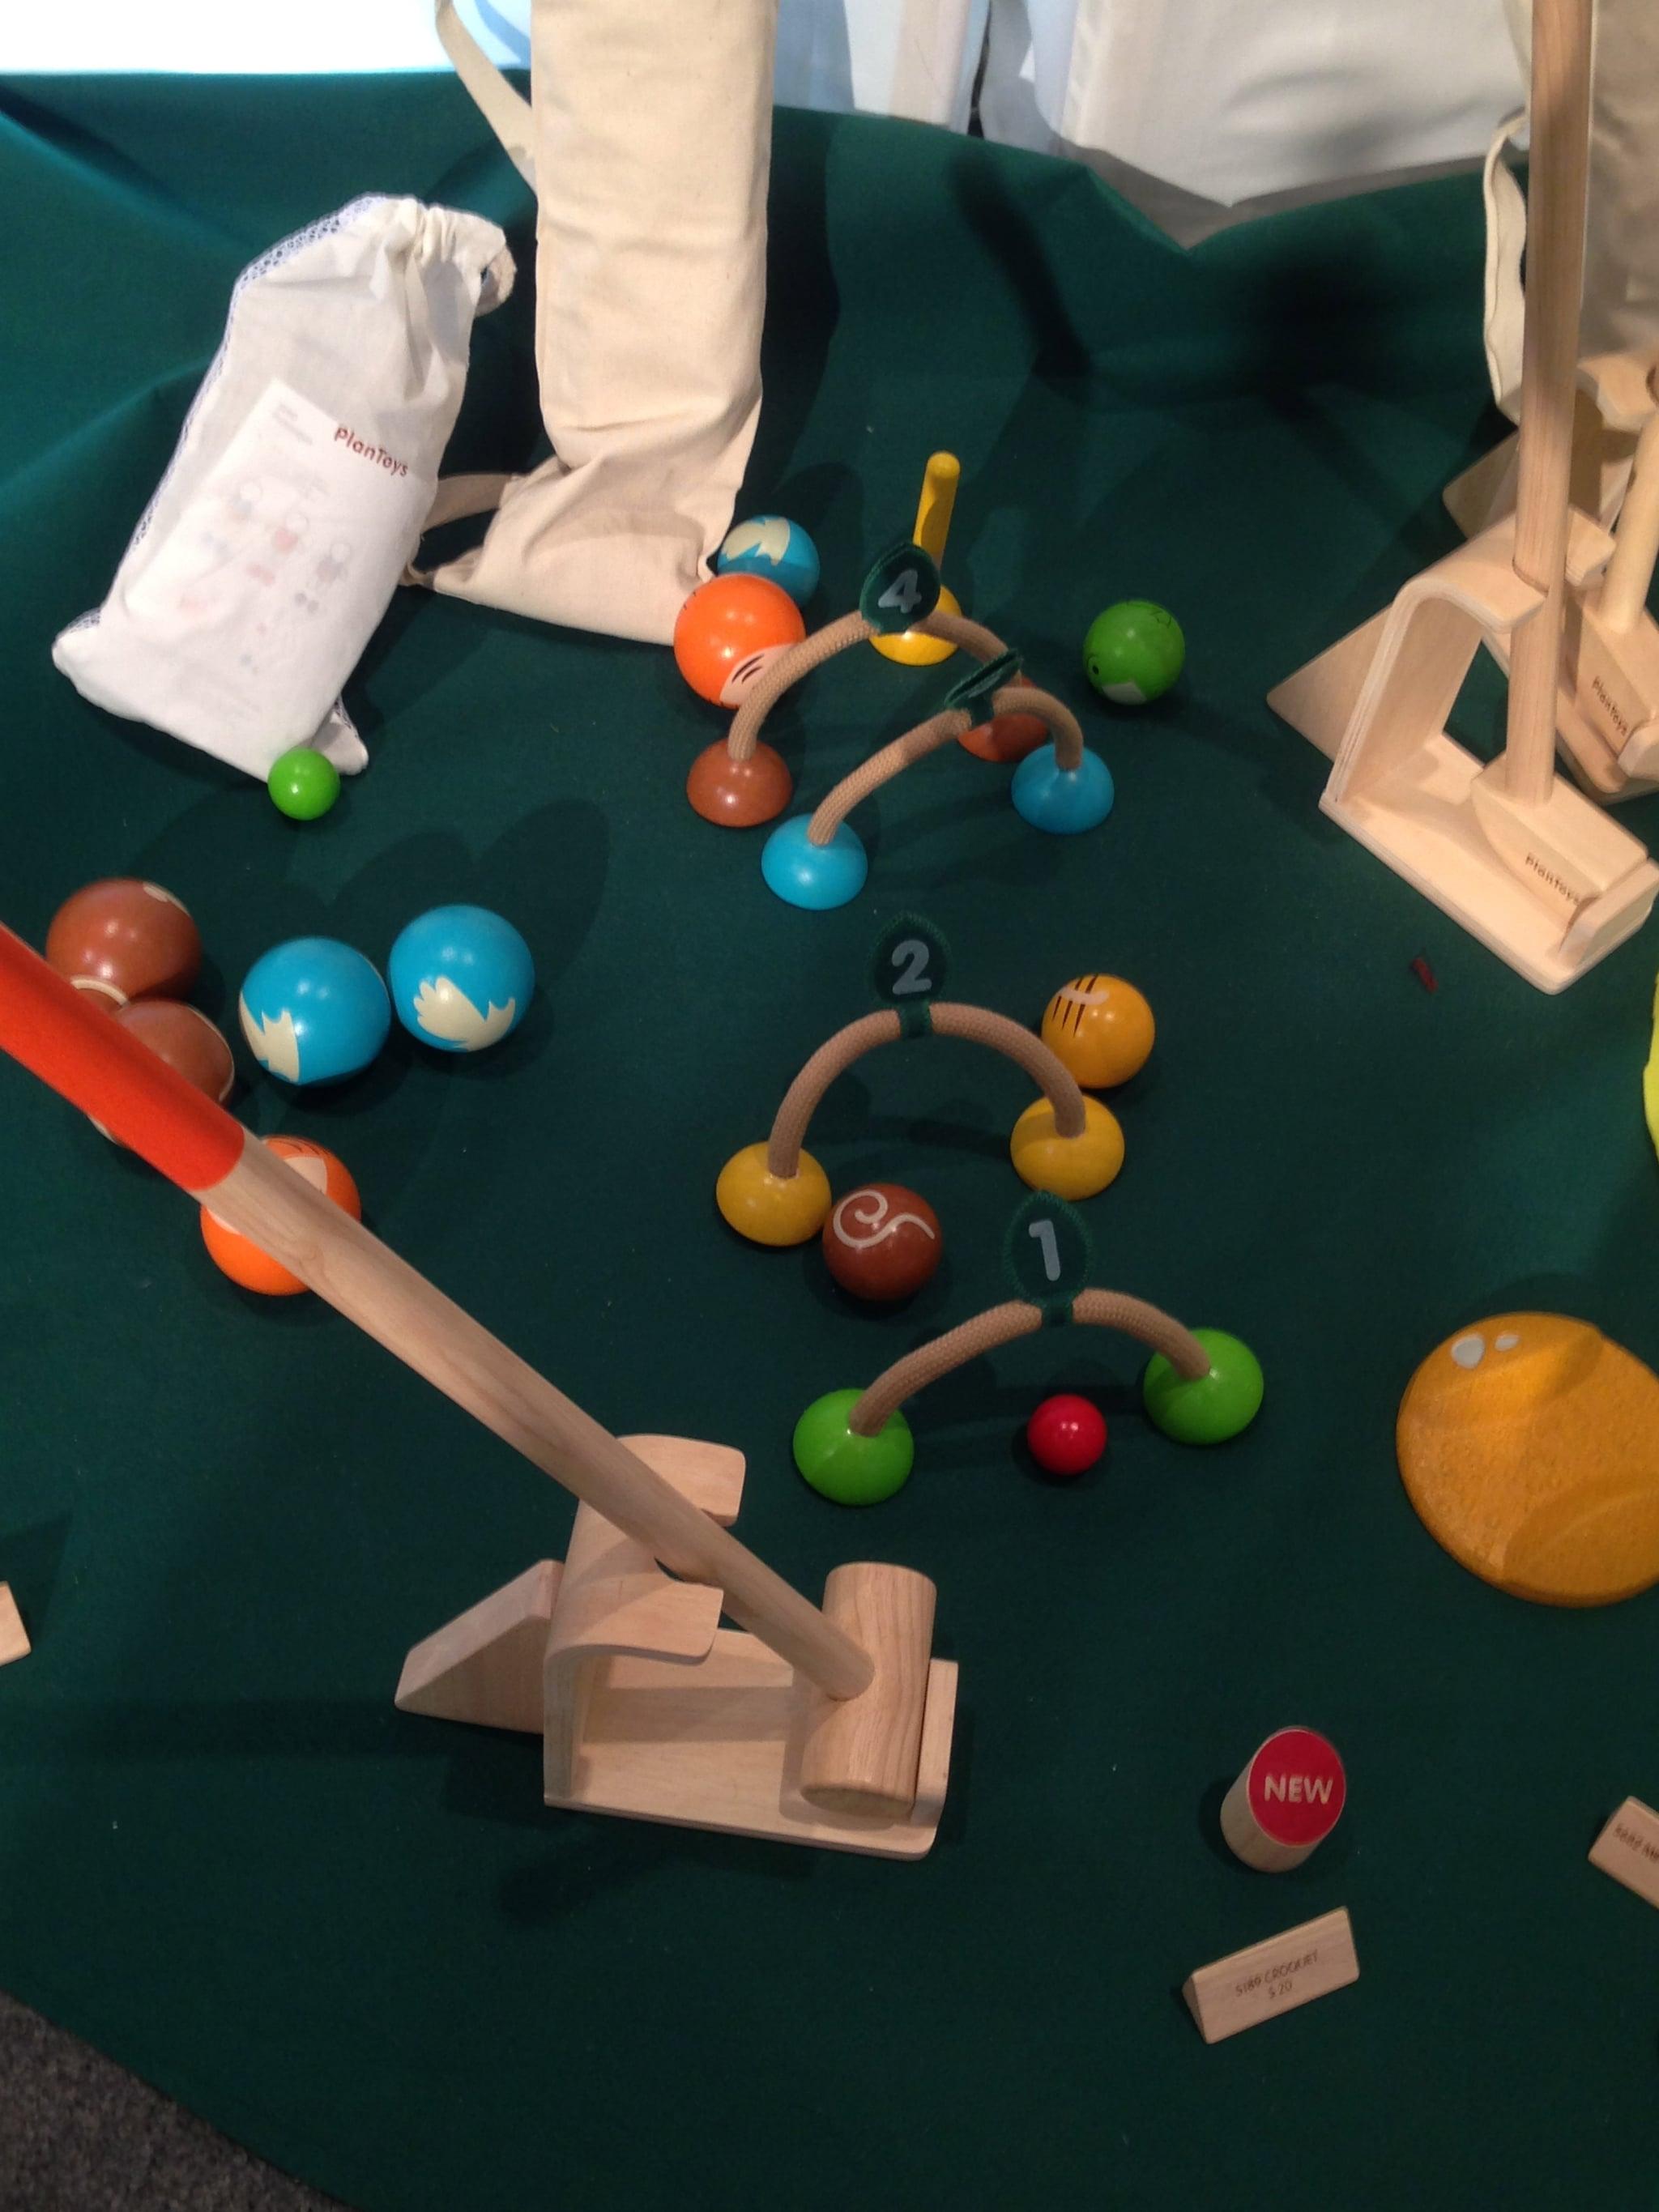 Play Toys Croquet Set